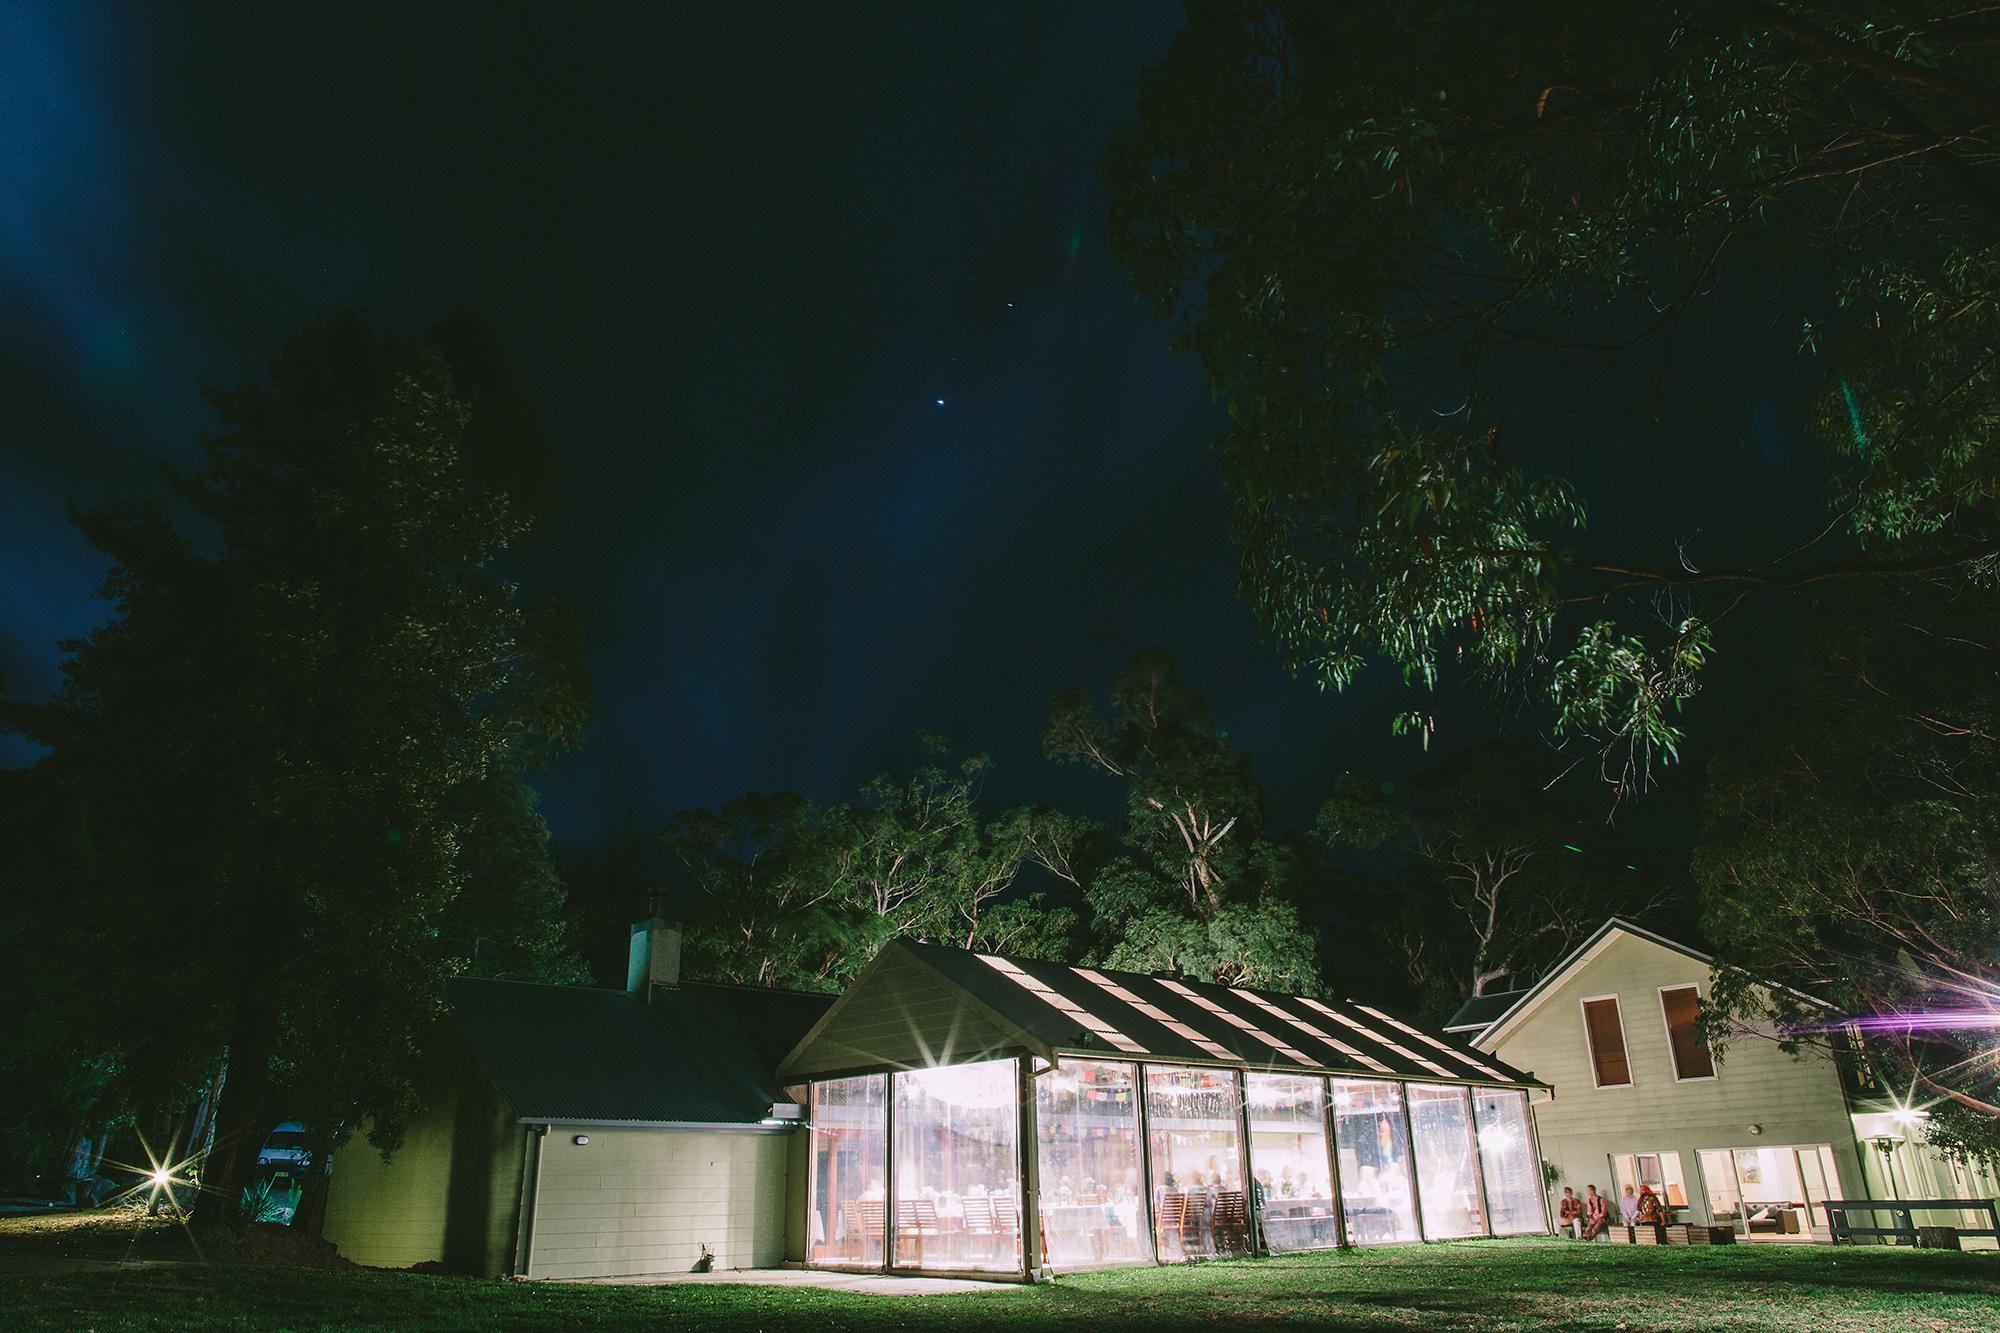 Kangaroo Valley Bush Retreat wedding reception venue